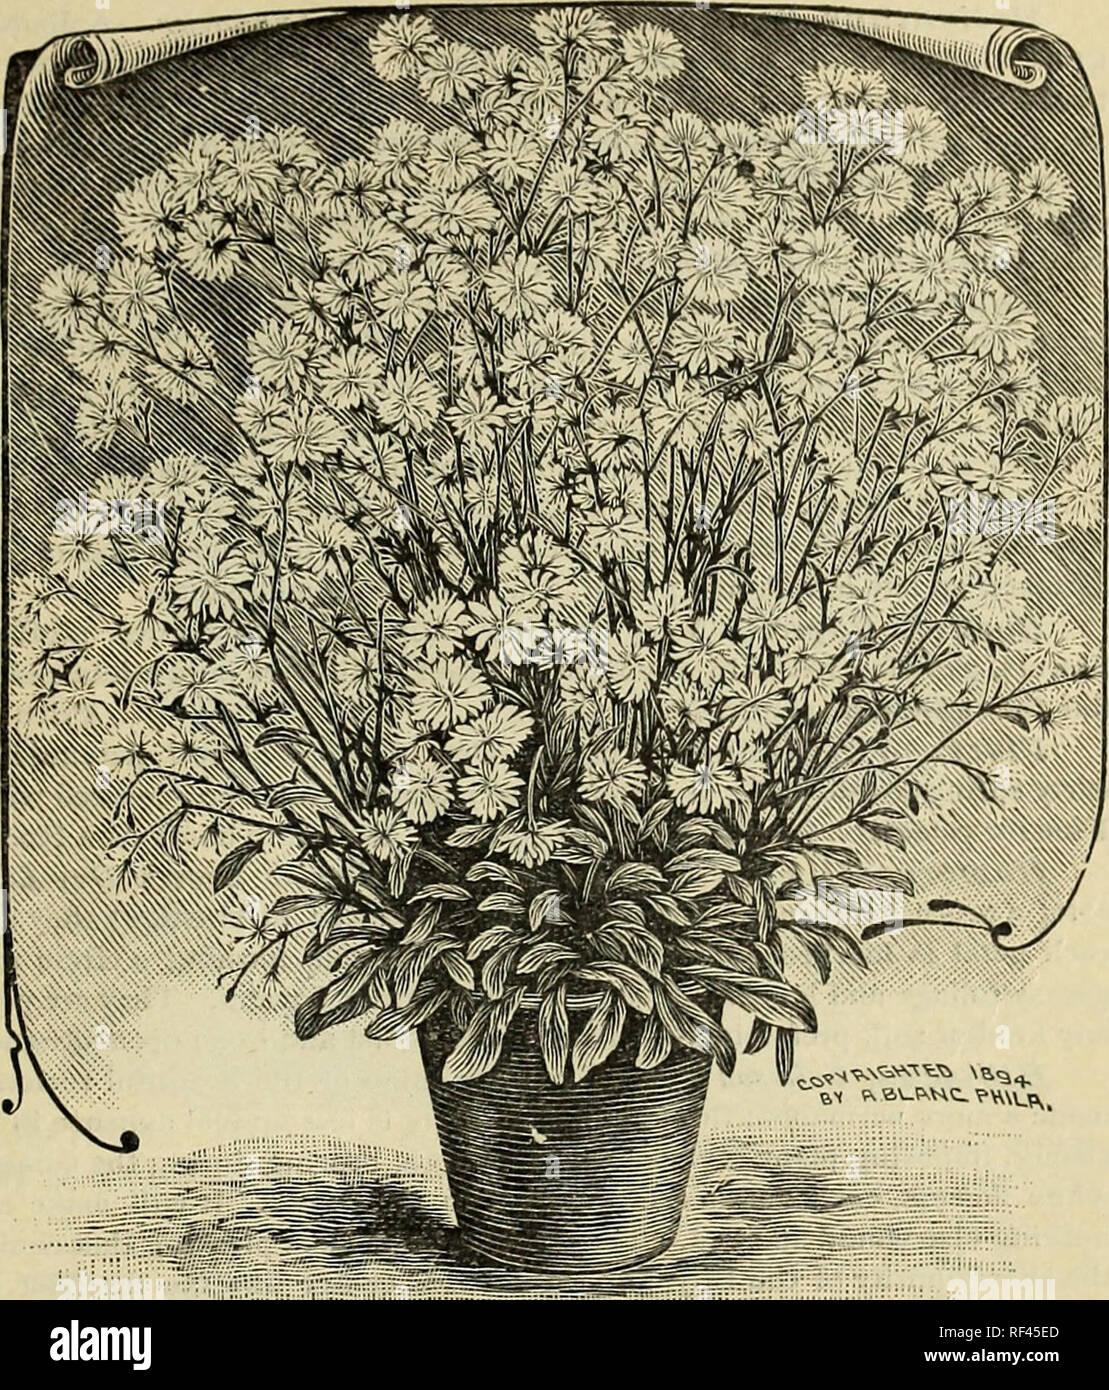 Plants, seeds, bulbs, and flowers : 26th year 1898  Nursery